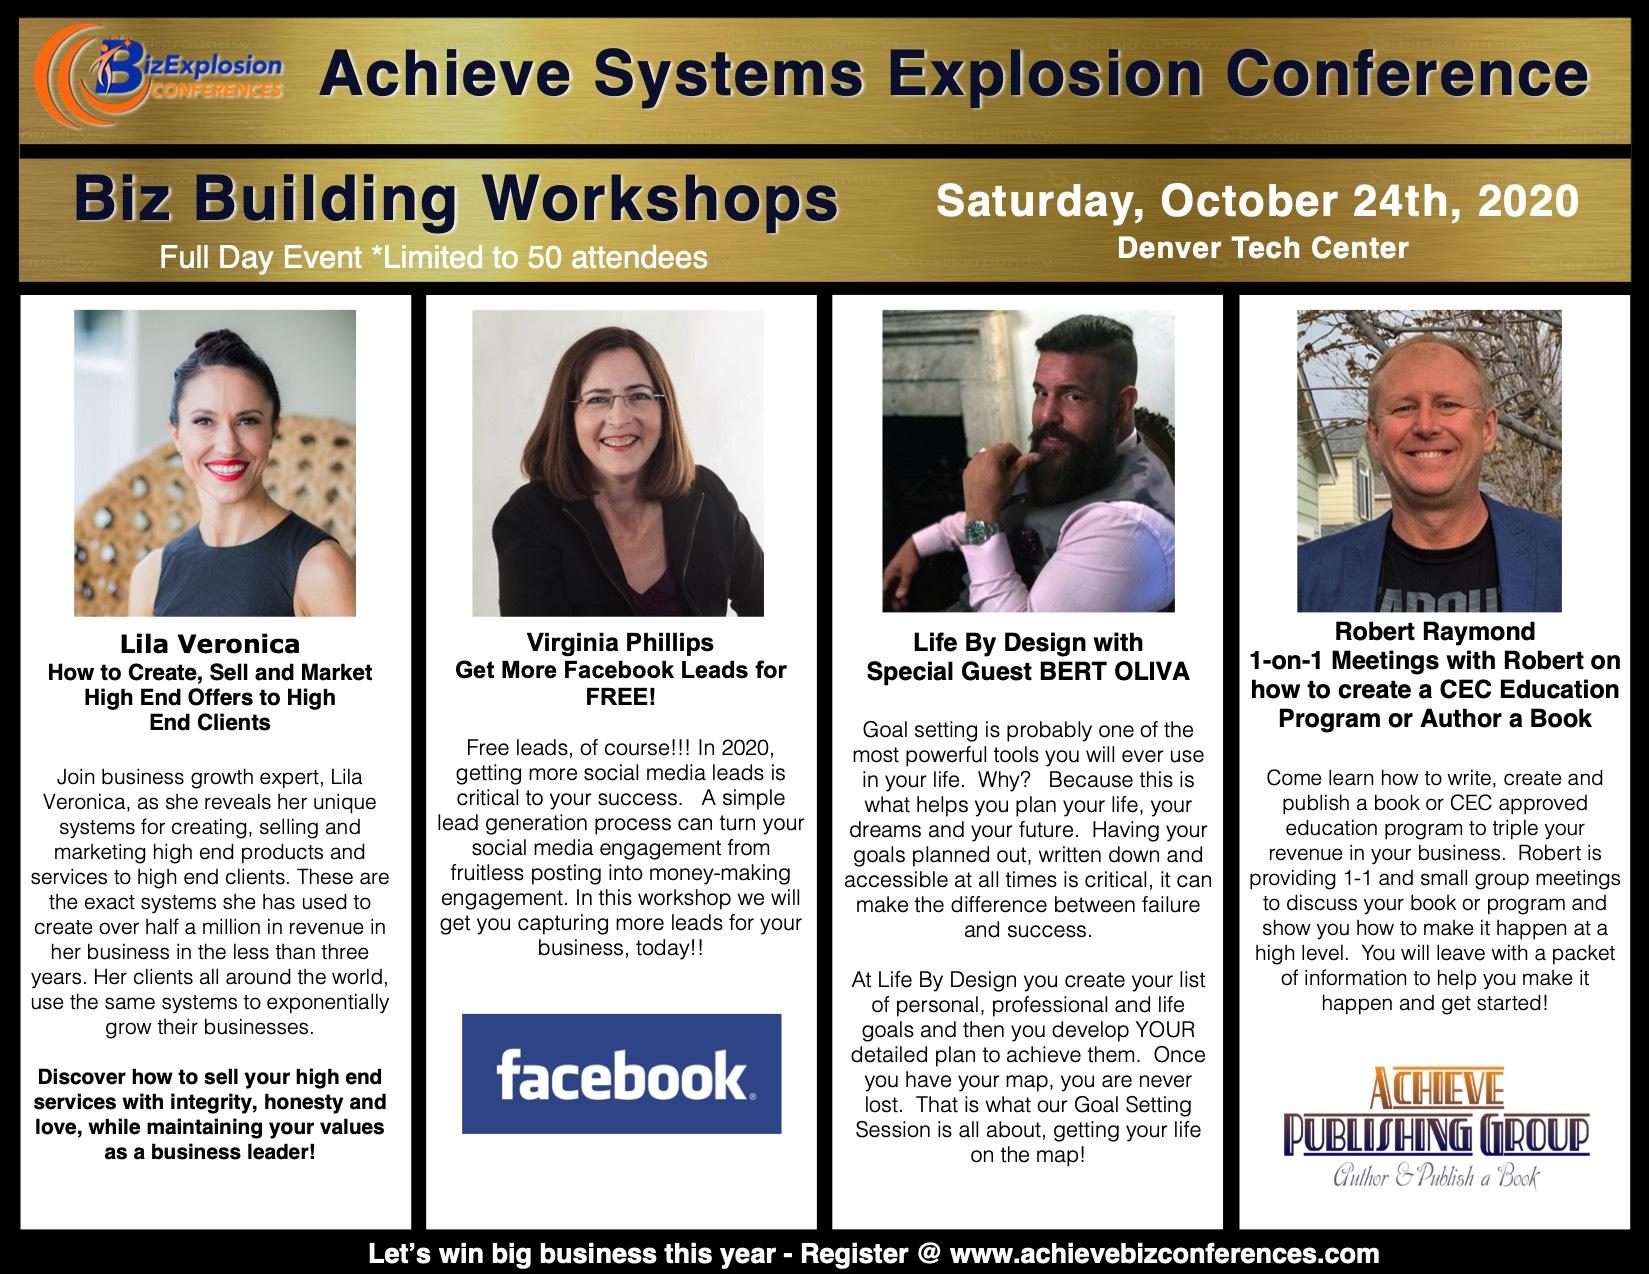 Saturday October 24th, biz building day!